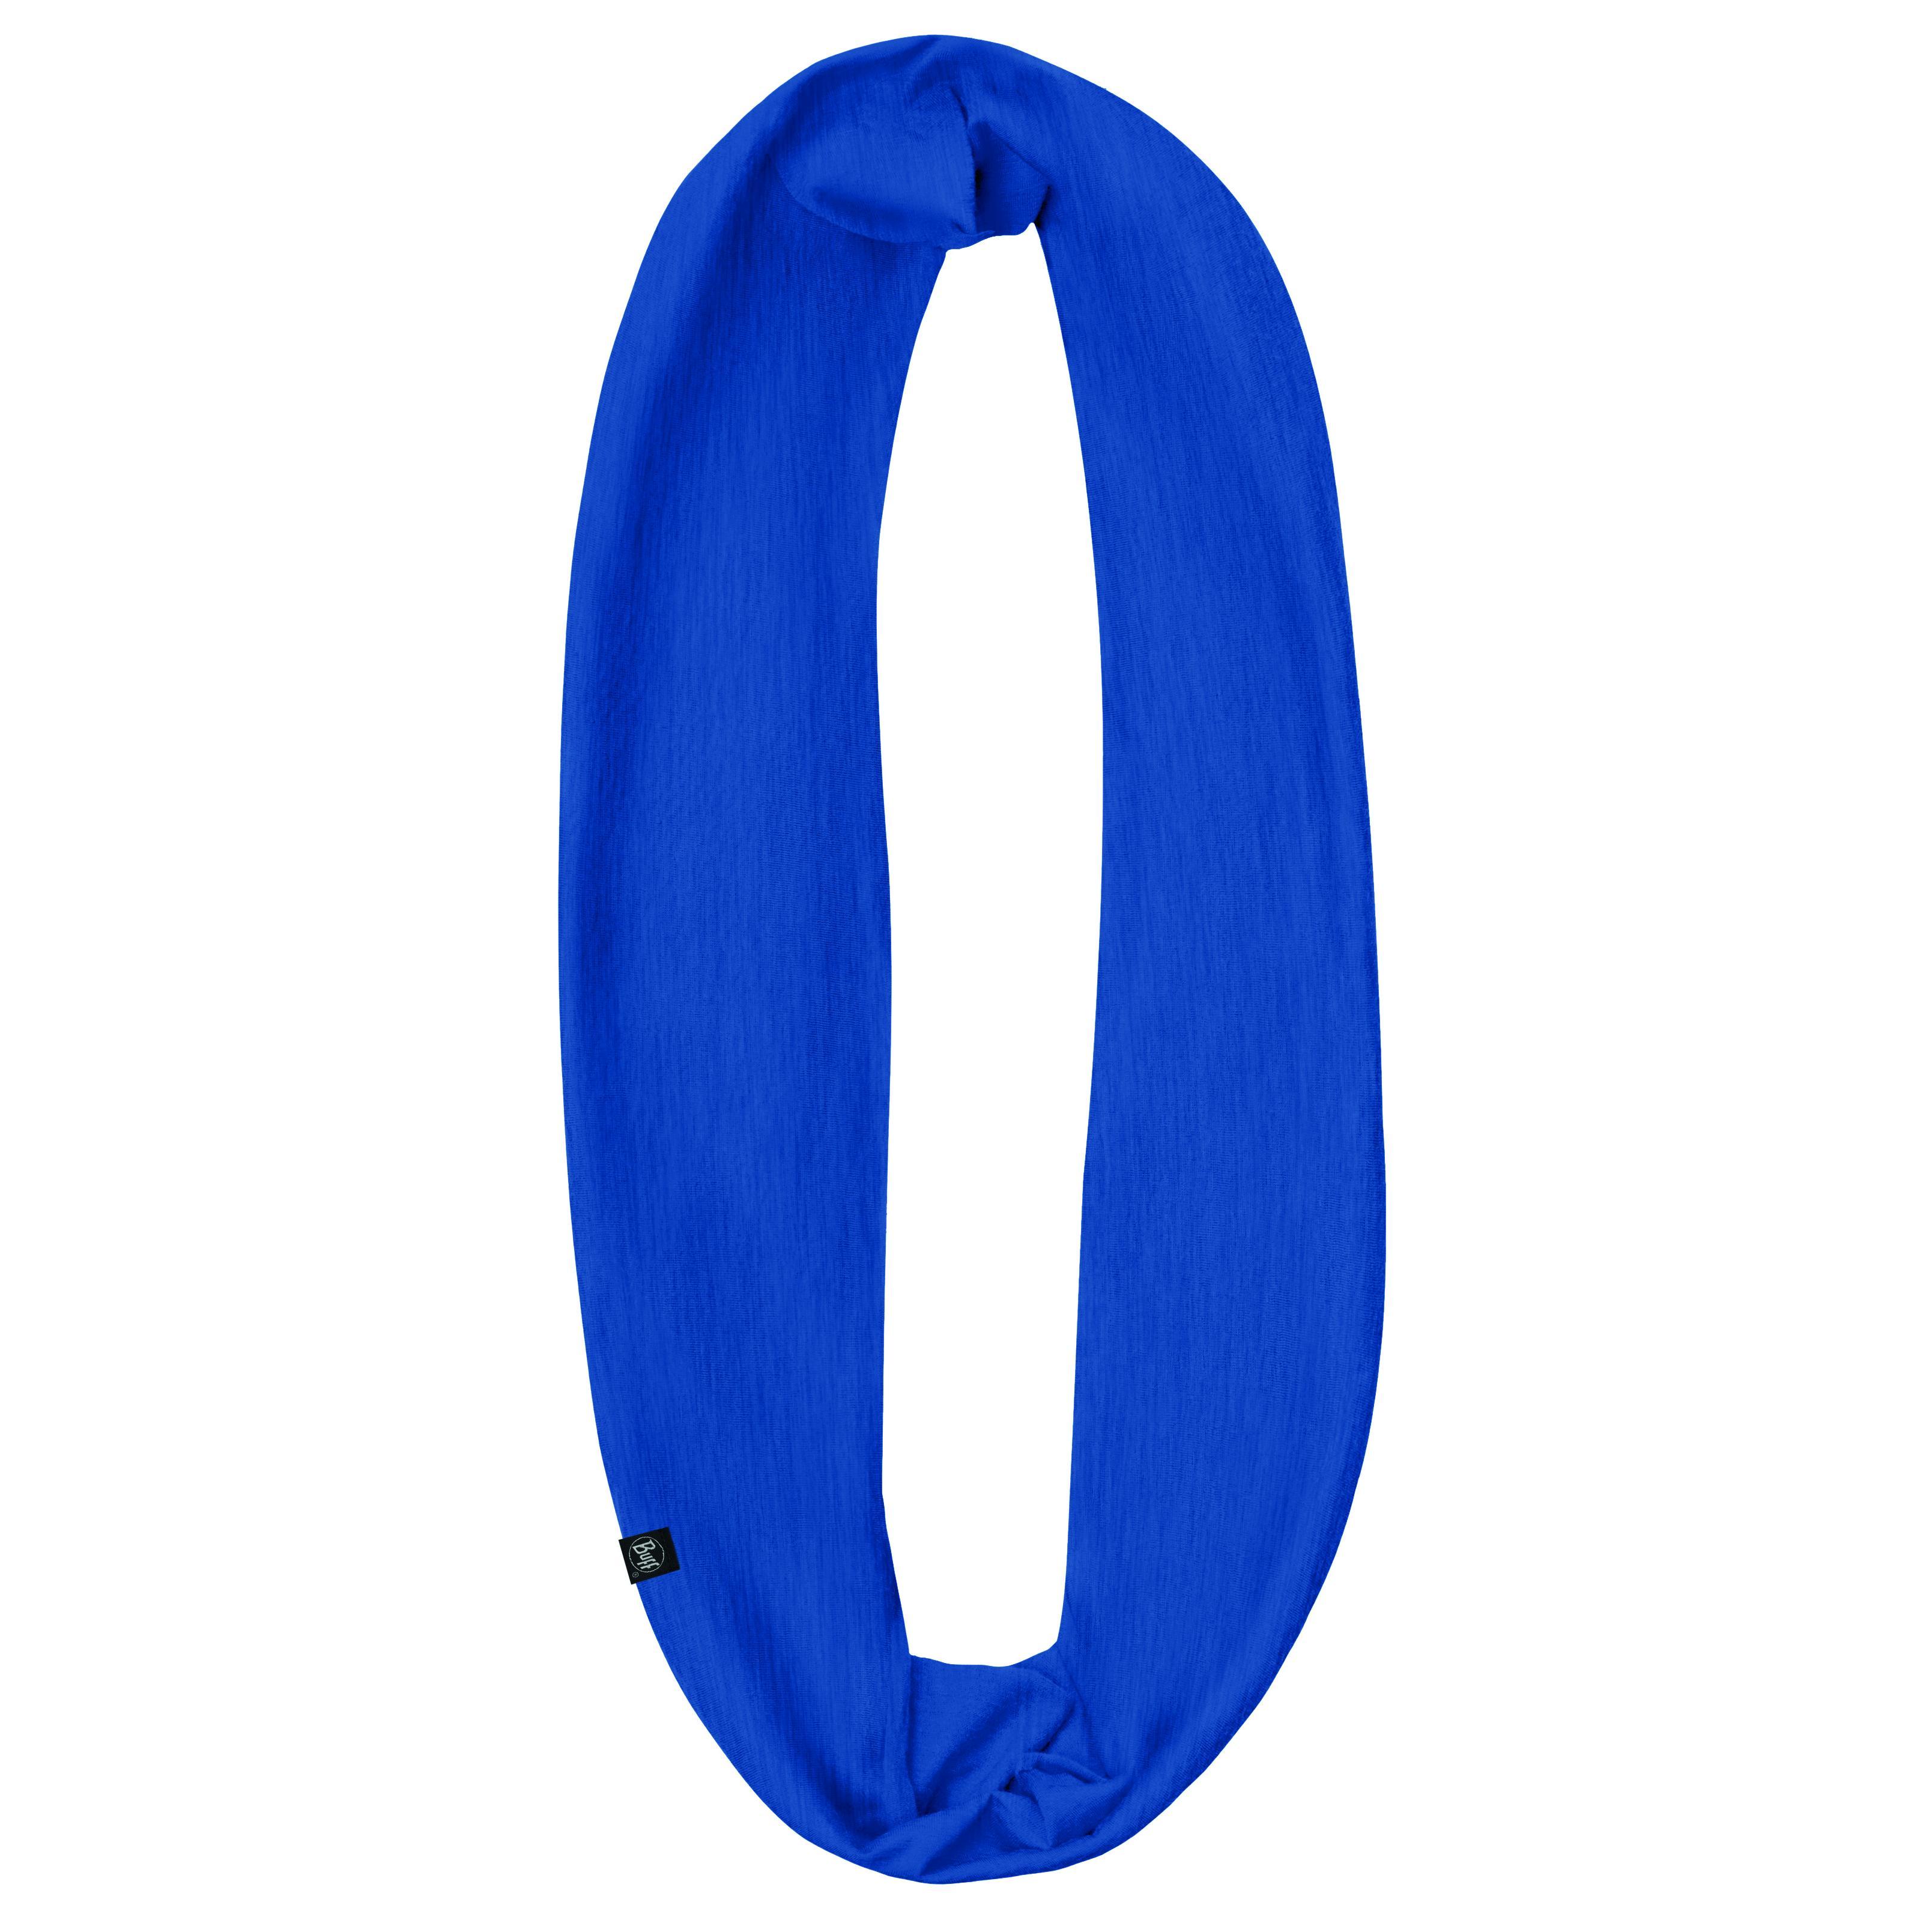 Шарф BUFF INFINITY SOLID MEDIEVAL BLUE Банданы и шарфы Buff ® 1312901  - купить со скидкой